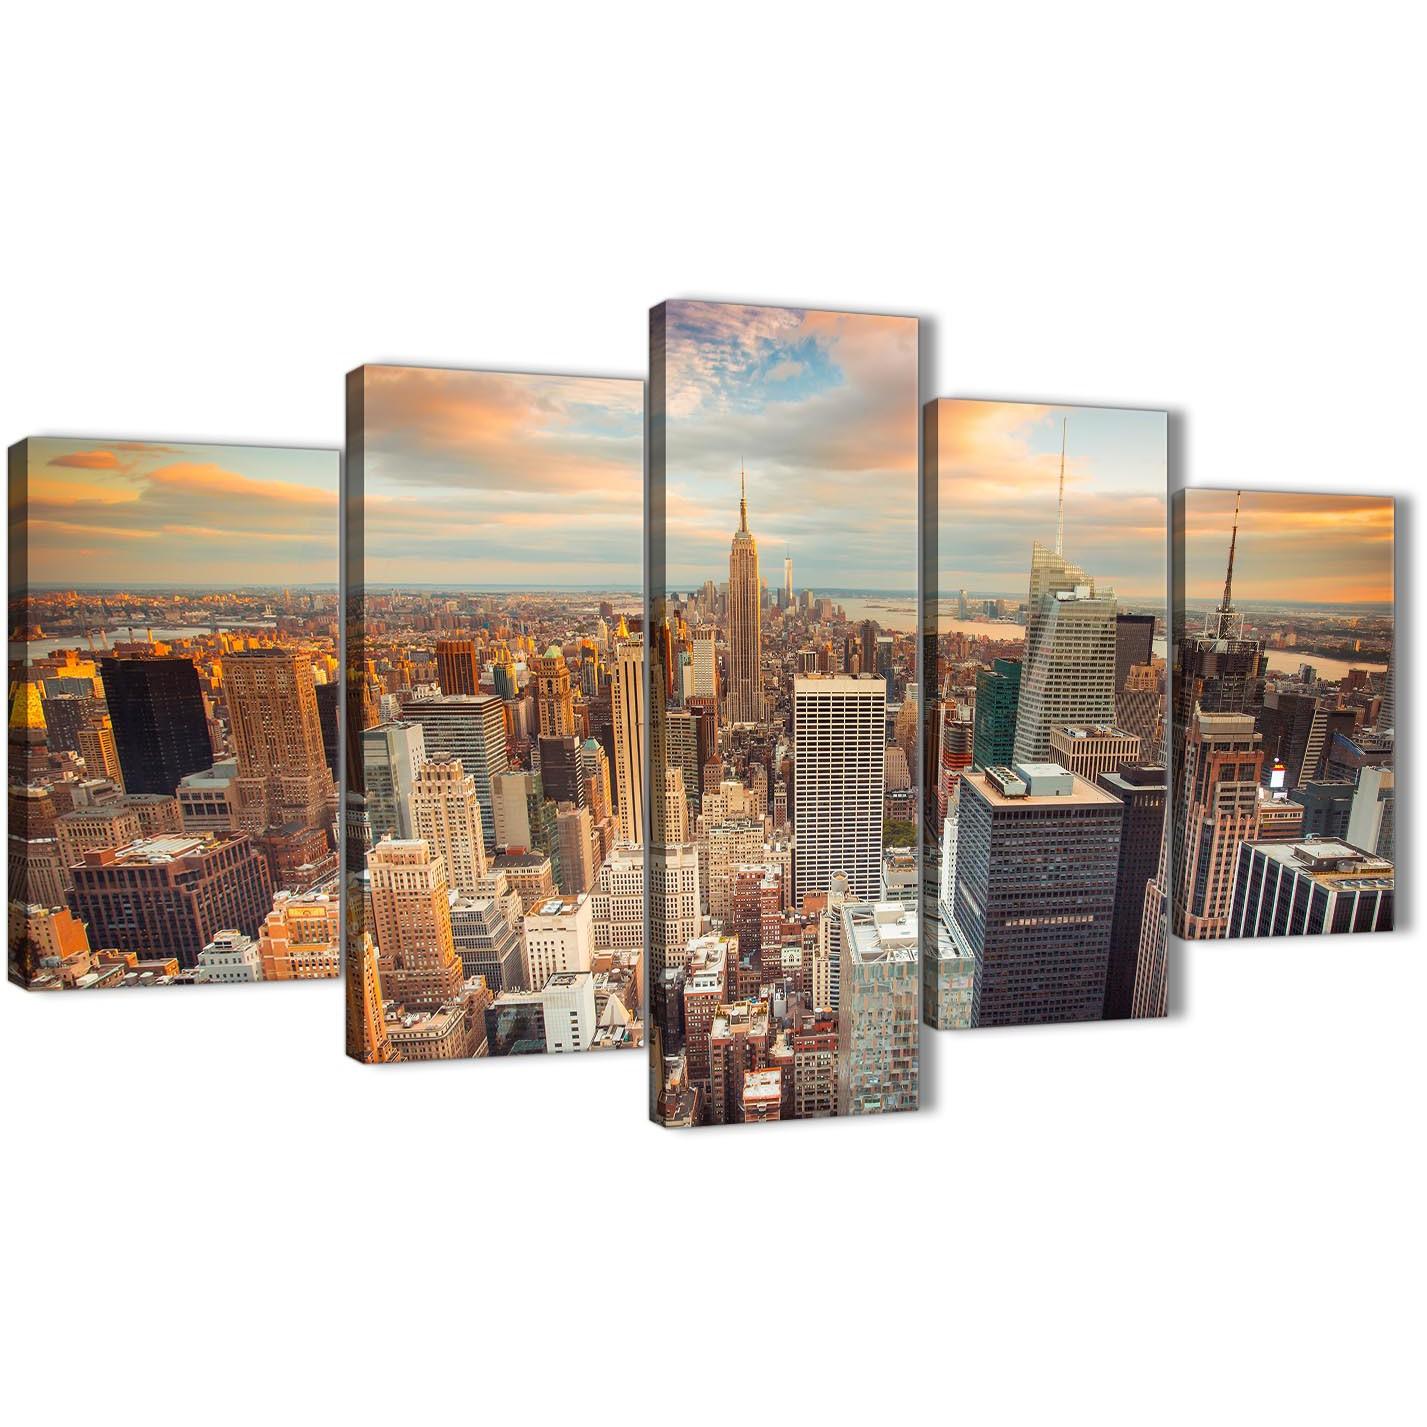 NYC Skyscraper Lunch Vintage SINGLE CANVAS WALL ART Picture Print VA